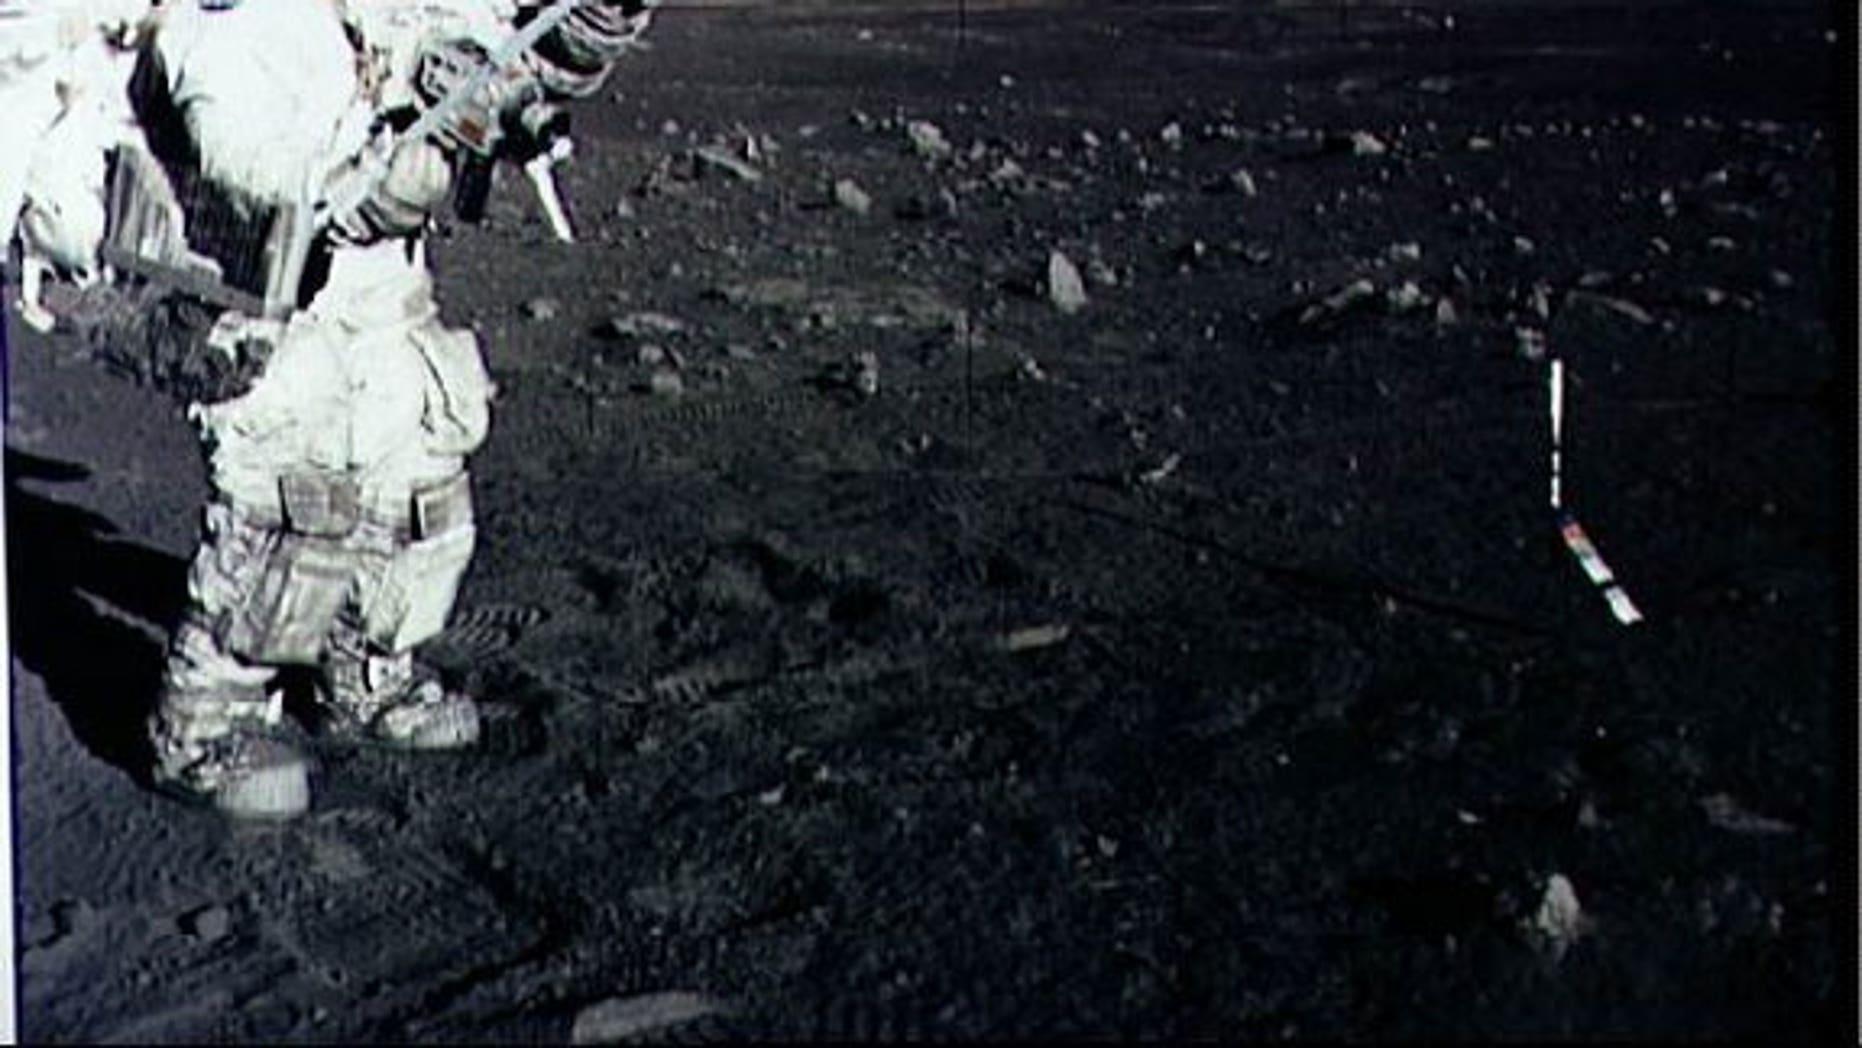 Astronaut Harrison Schmitt collects lunar rake samples during an Apollo 17 moonwalk in December 1973.